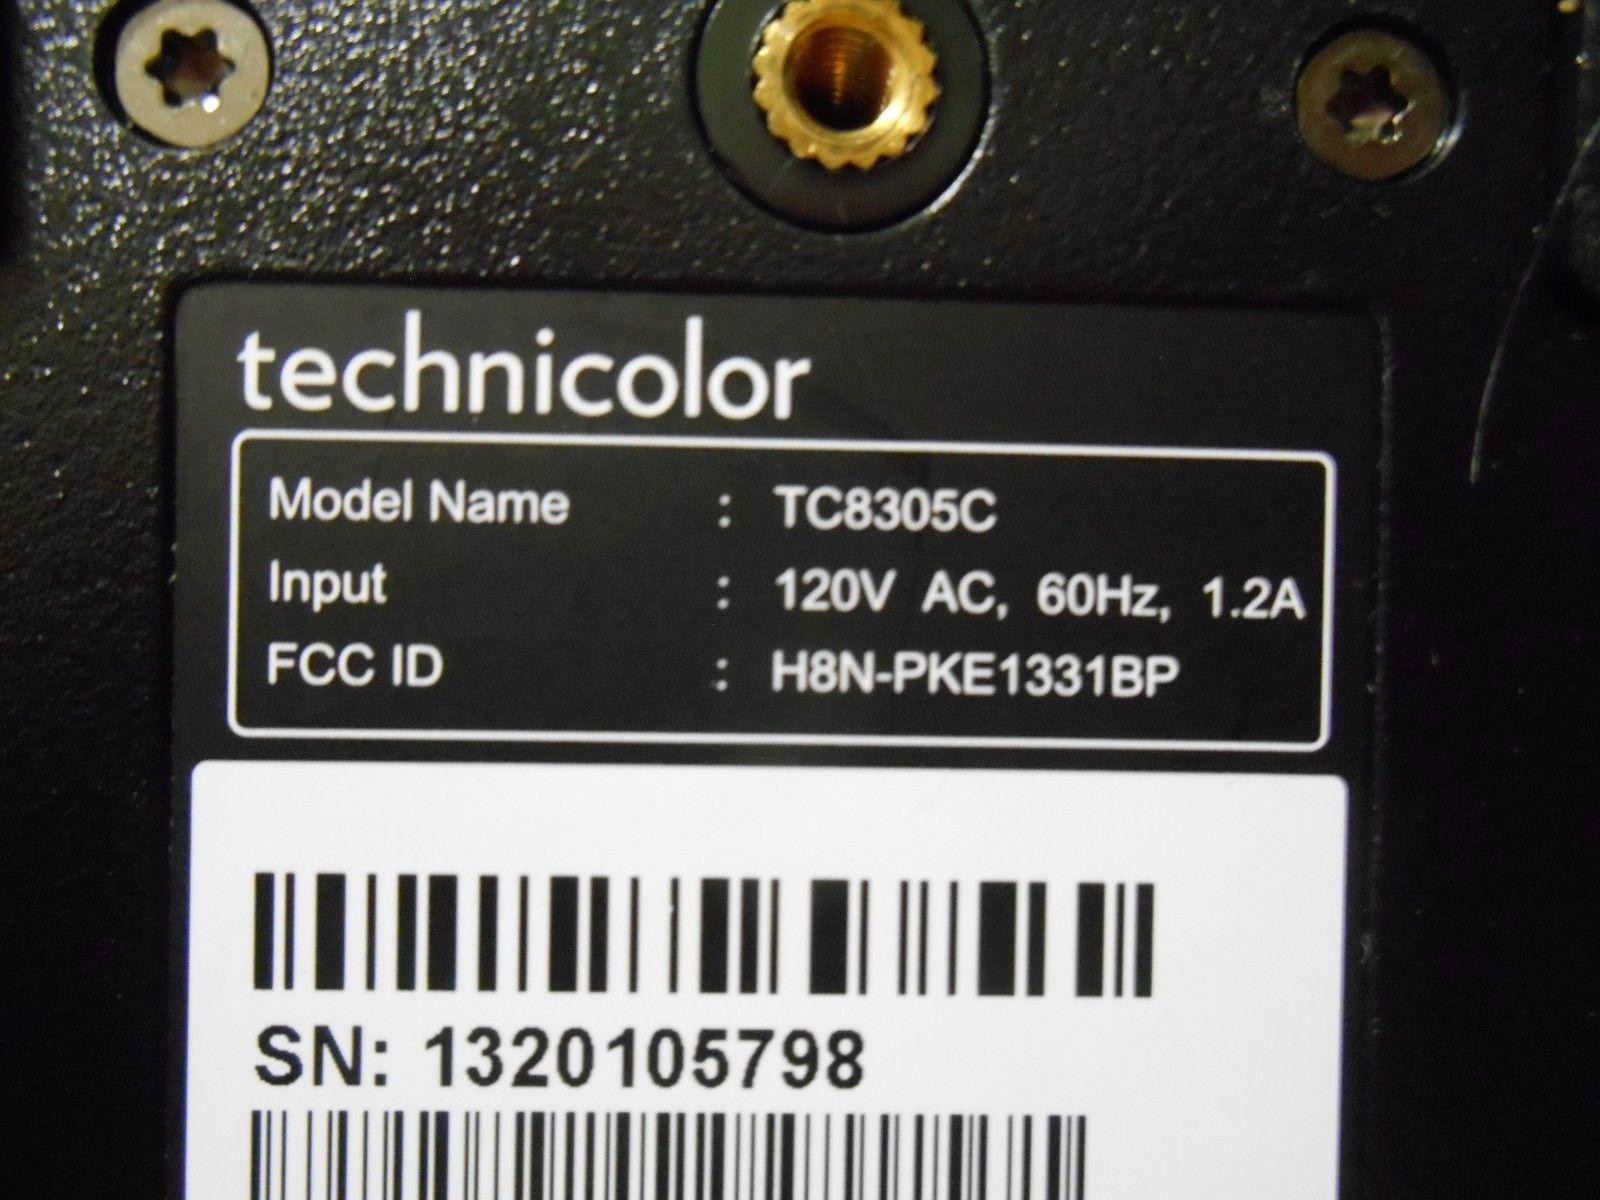 Comcast Xfinity Techniclor TC8305C Wireless and 44 similar items